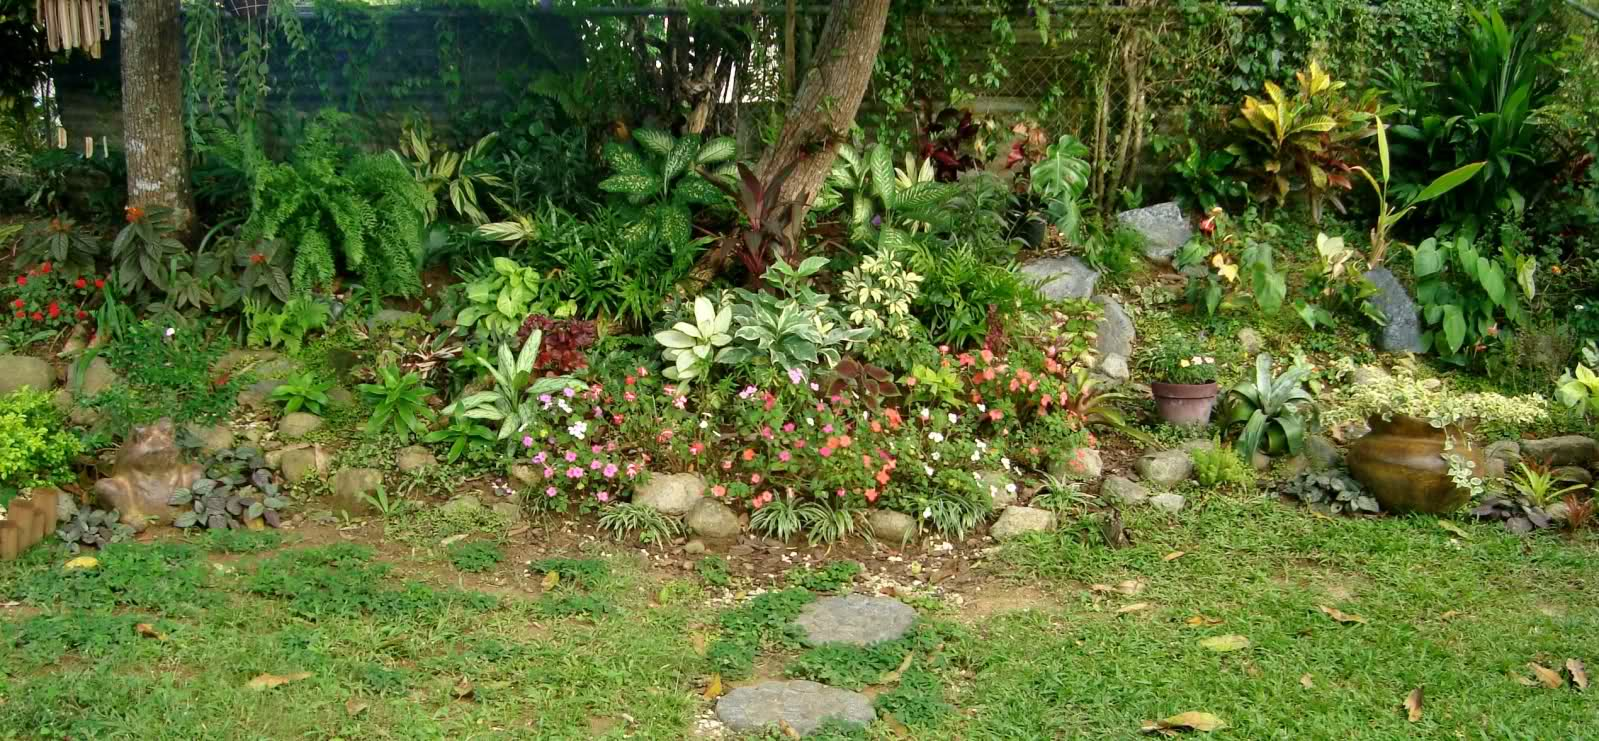 Fotos de mi jard n tropical for Jardines de hogar